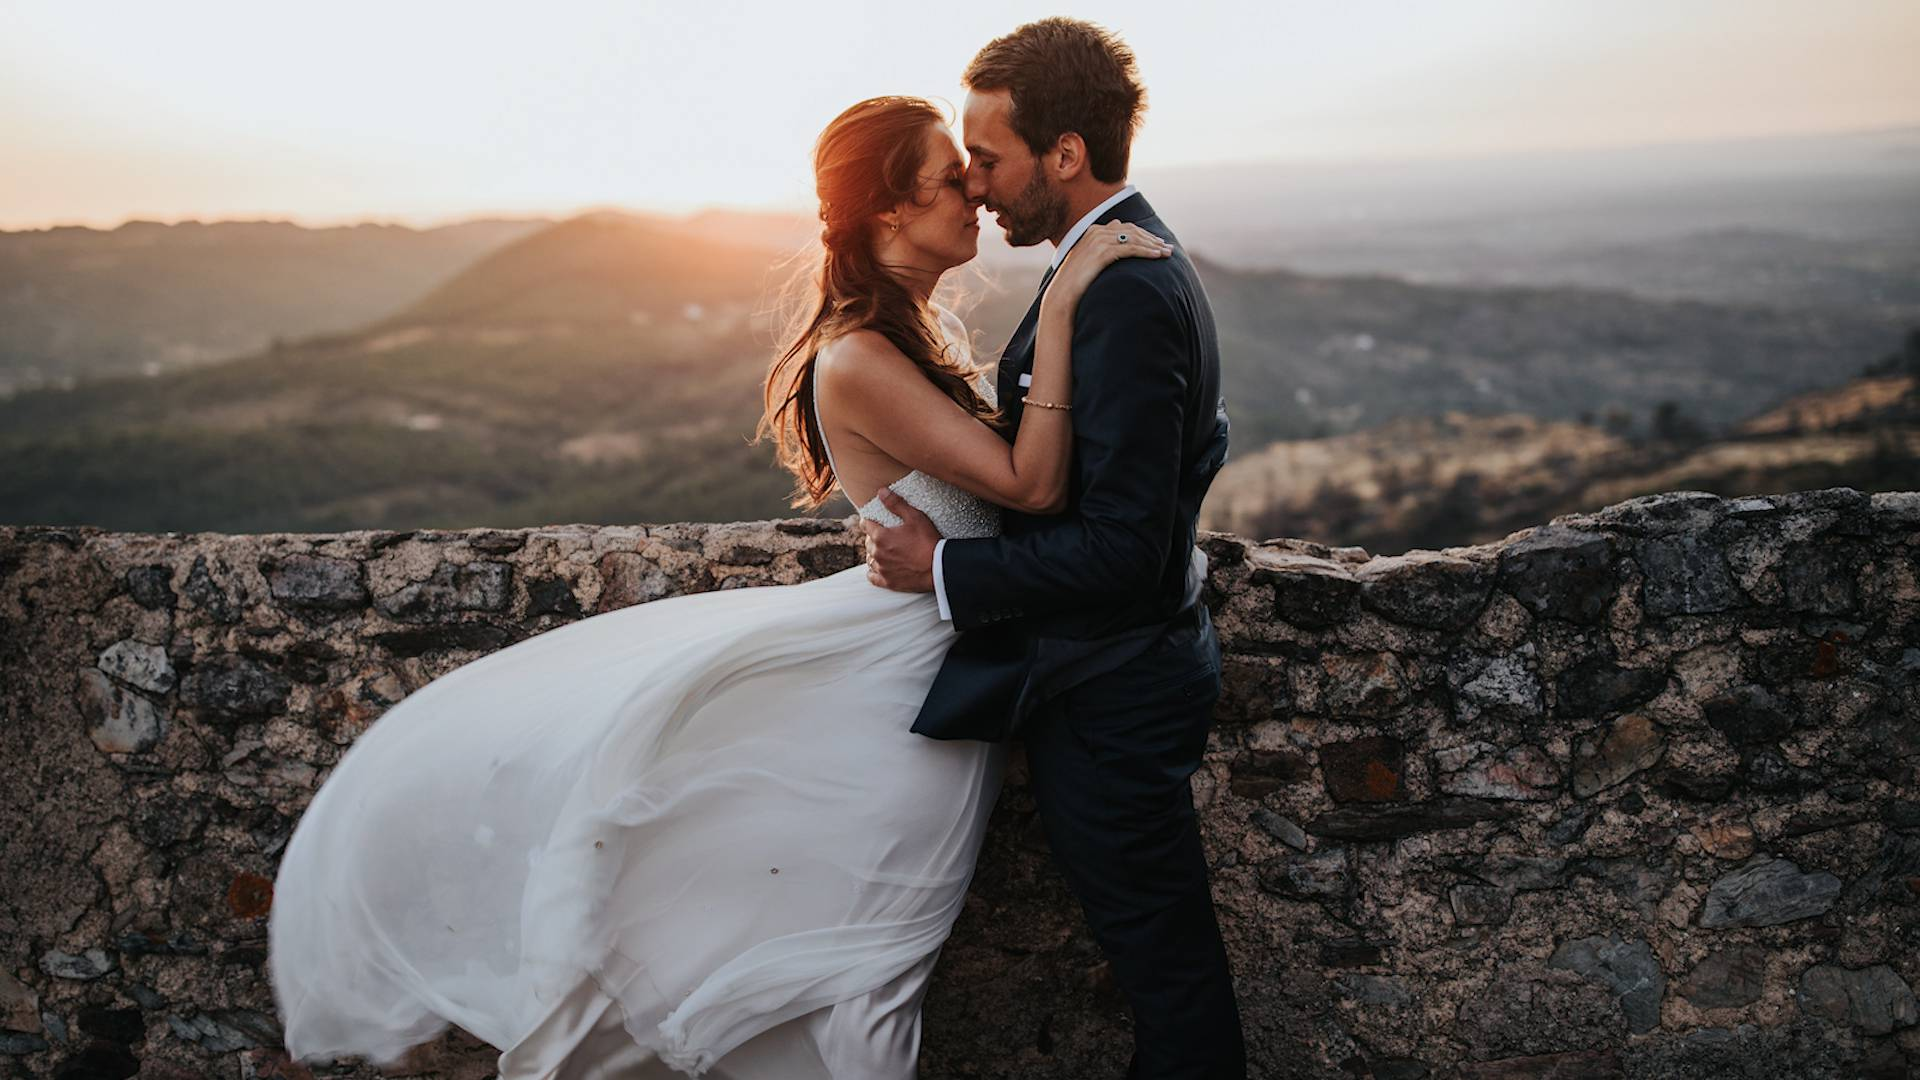 Wonderful wedding at Castelo de Marvão